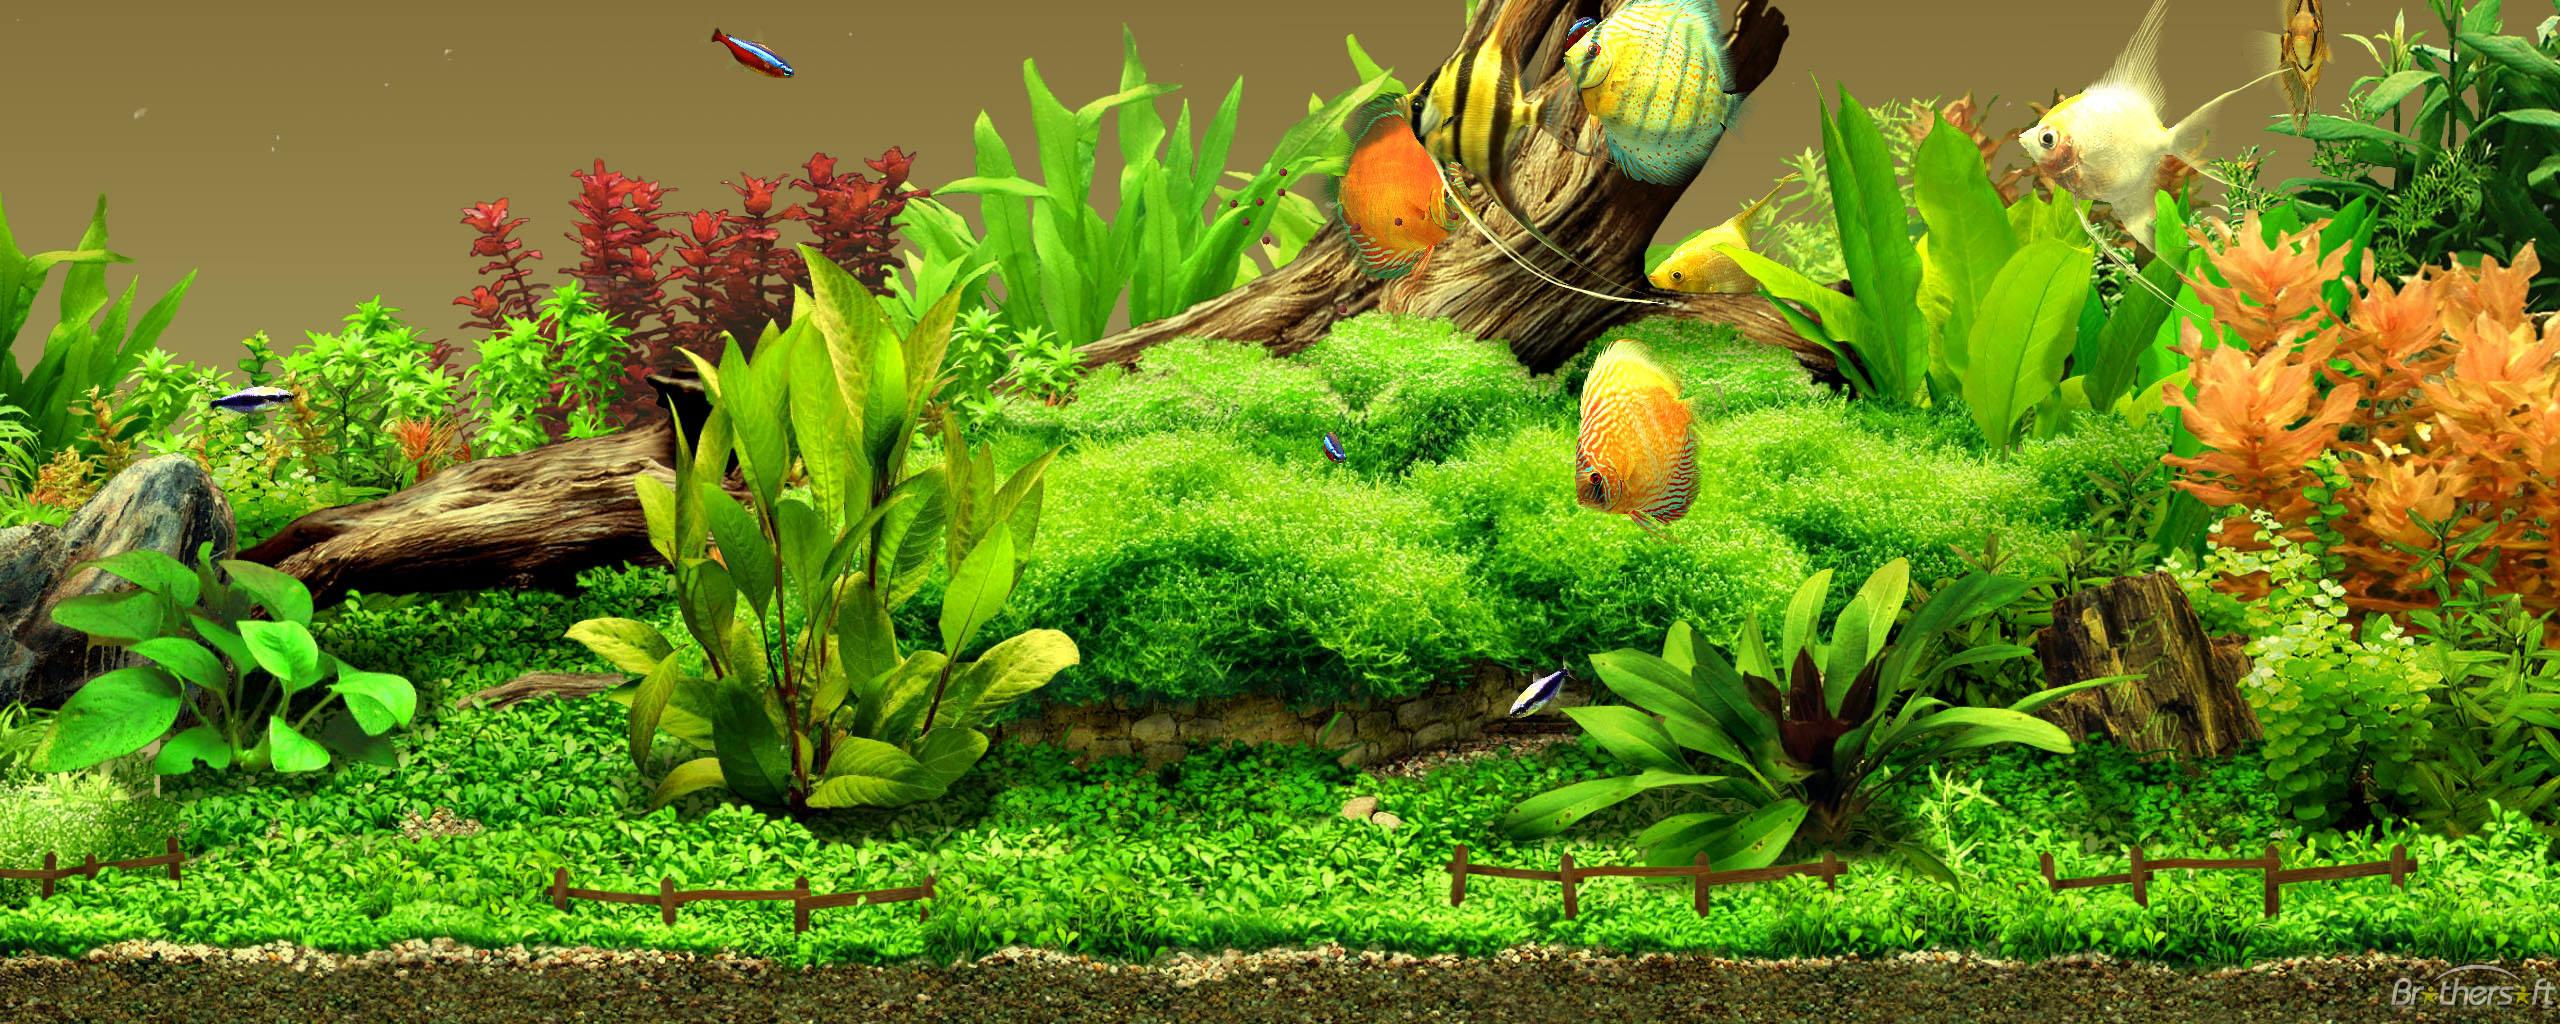 22 aquarium backgrounds wallpapers